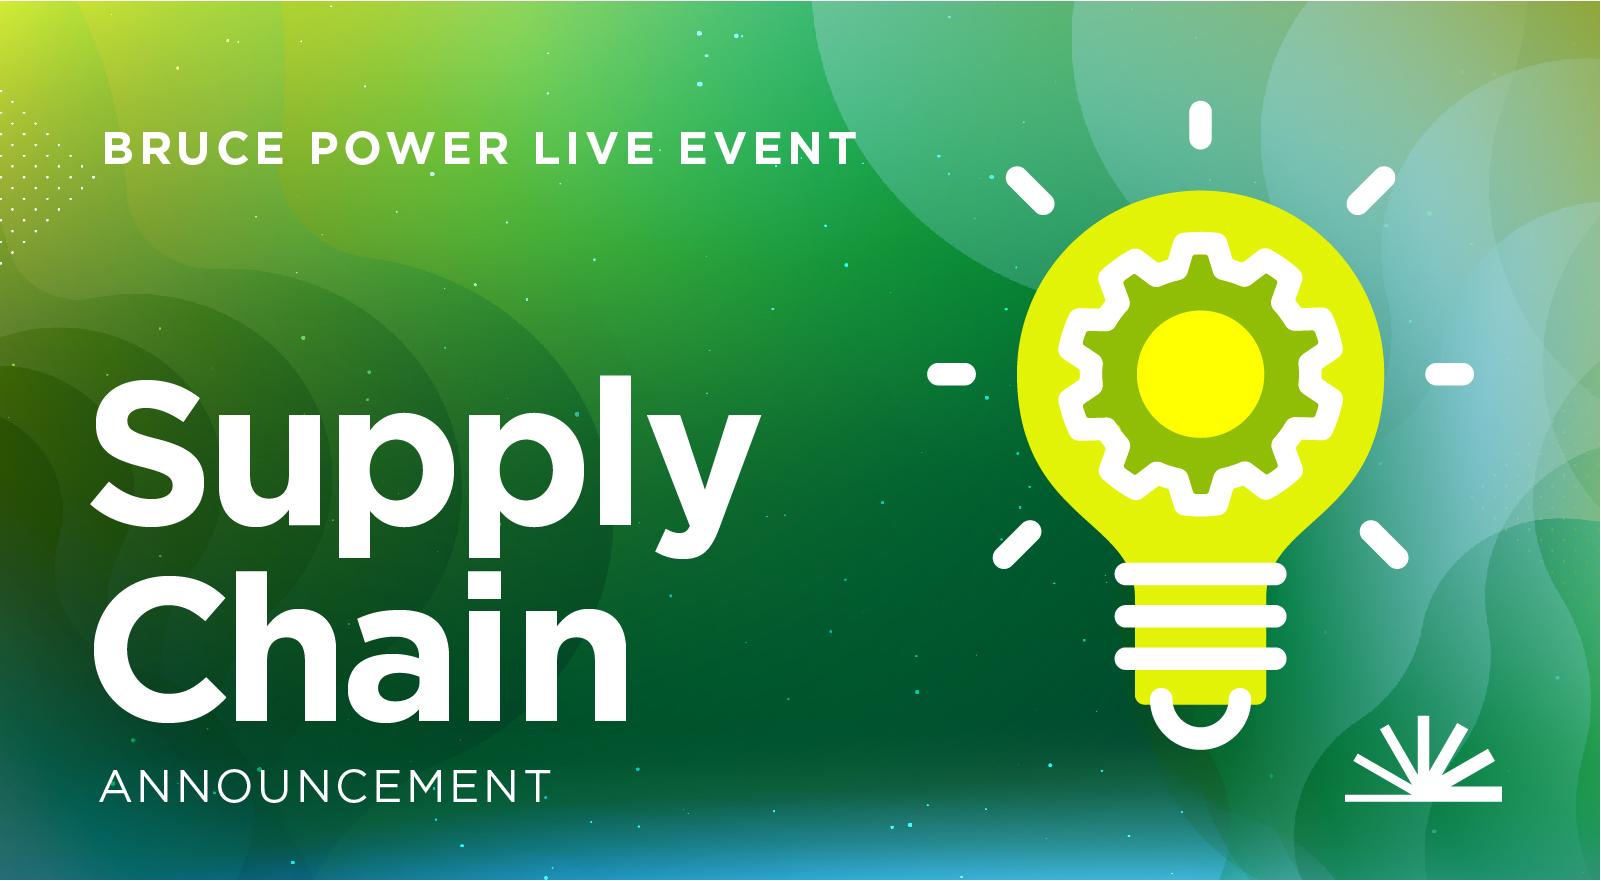 Supply Chain announcement